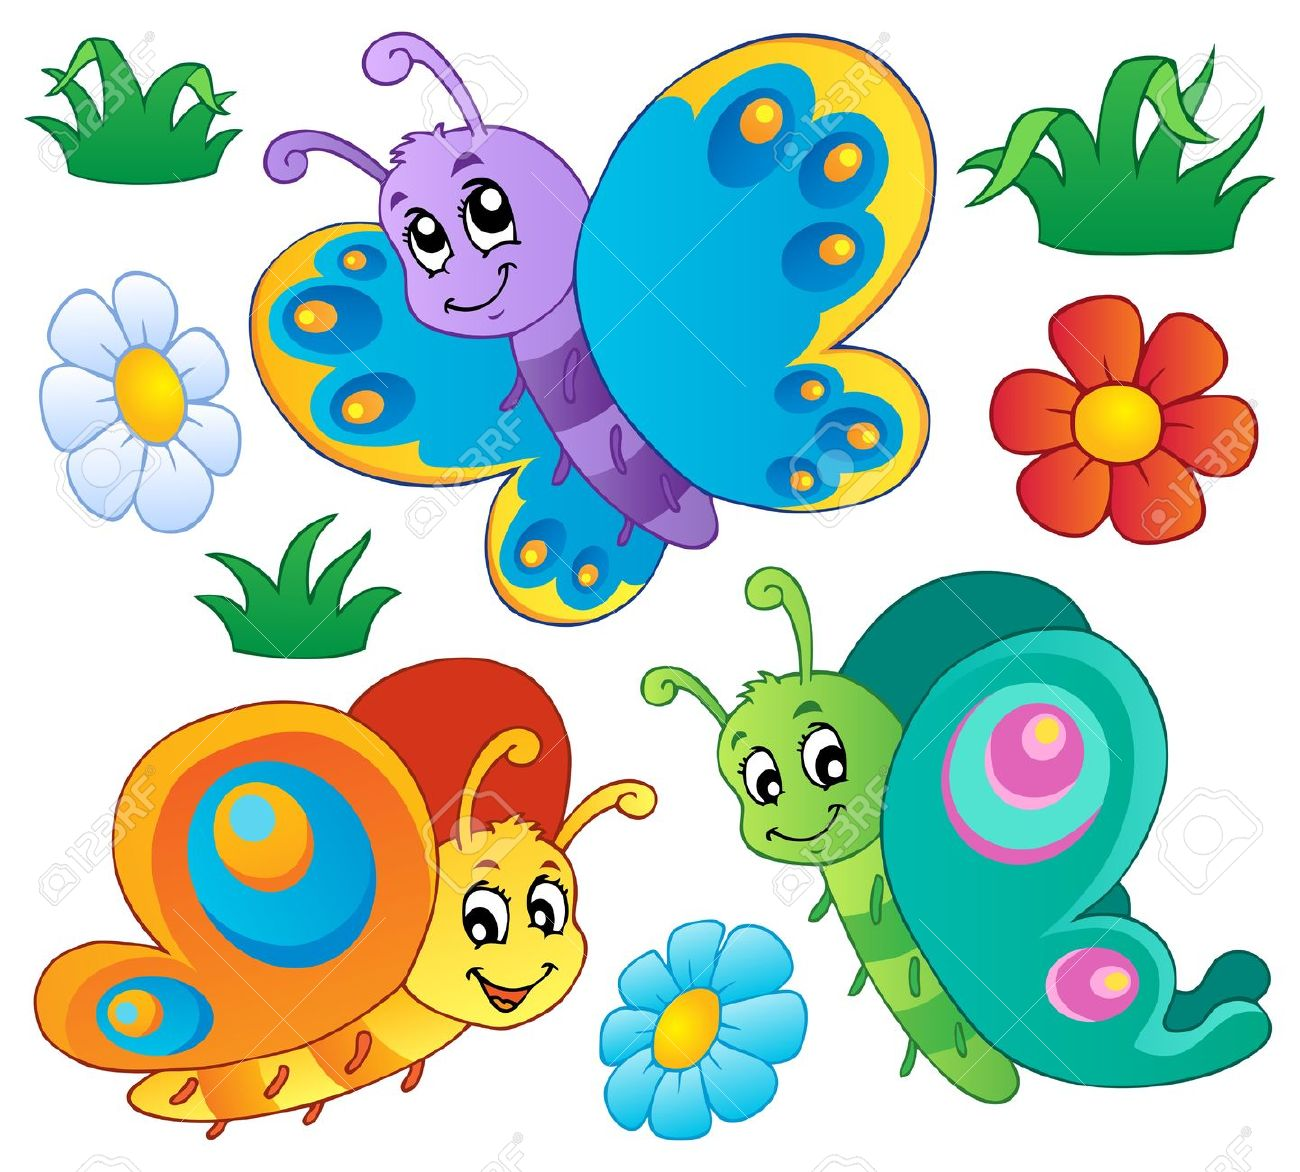 Butterflies cute butterfly clipart images clipartall